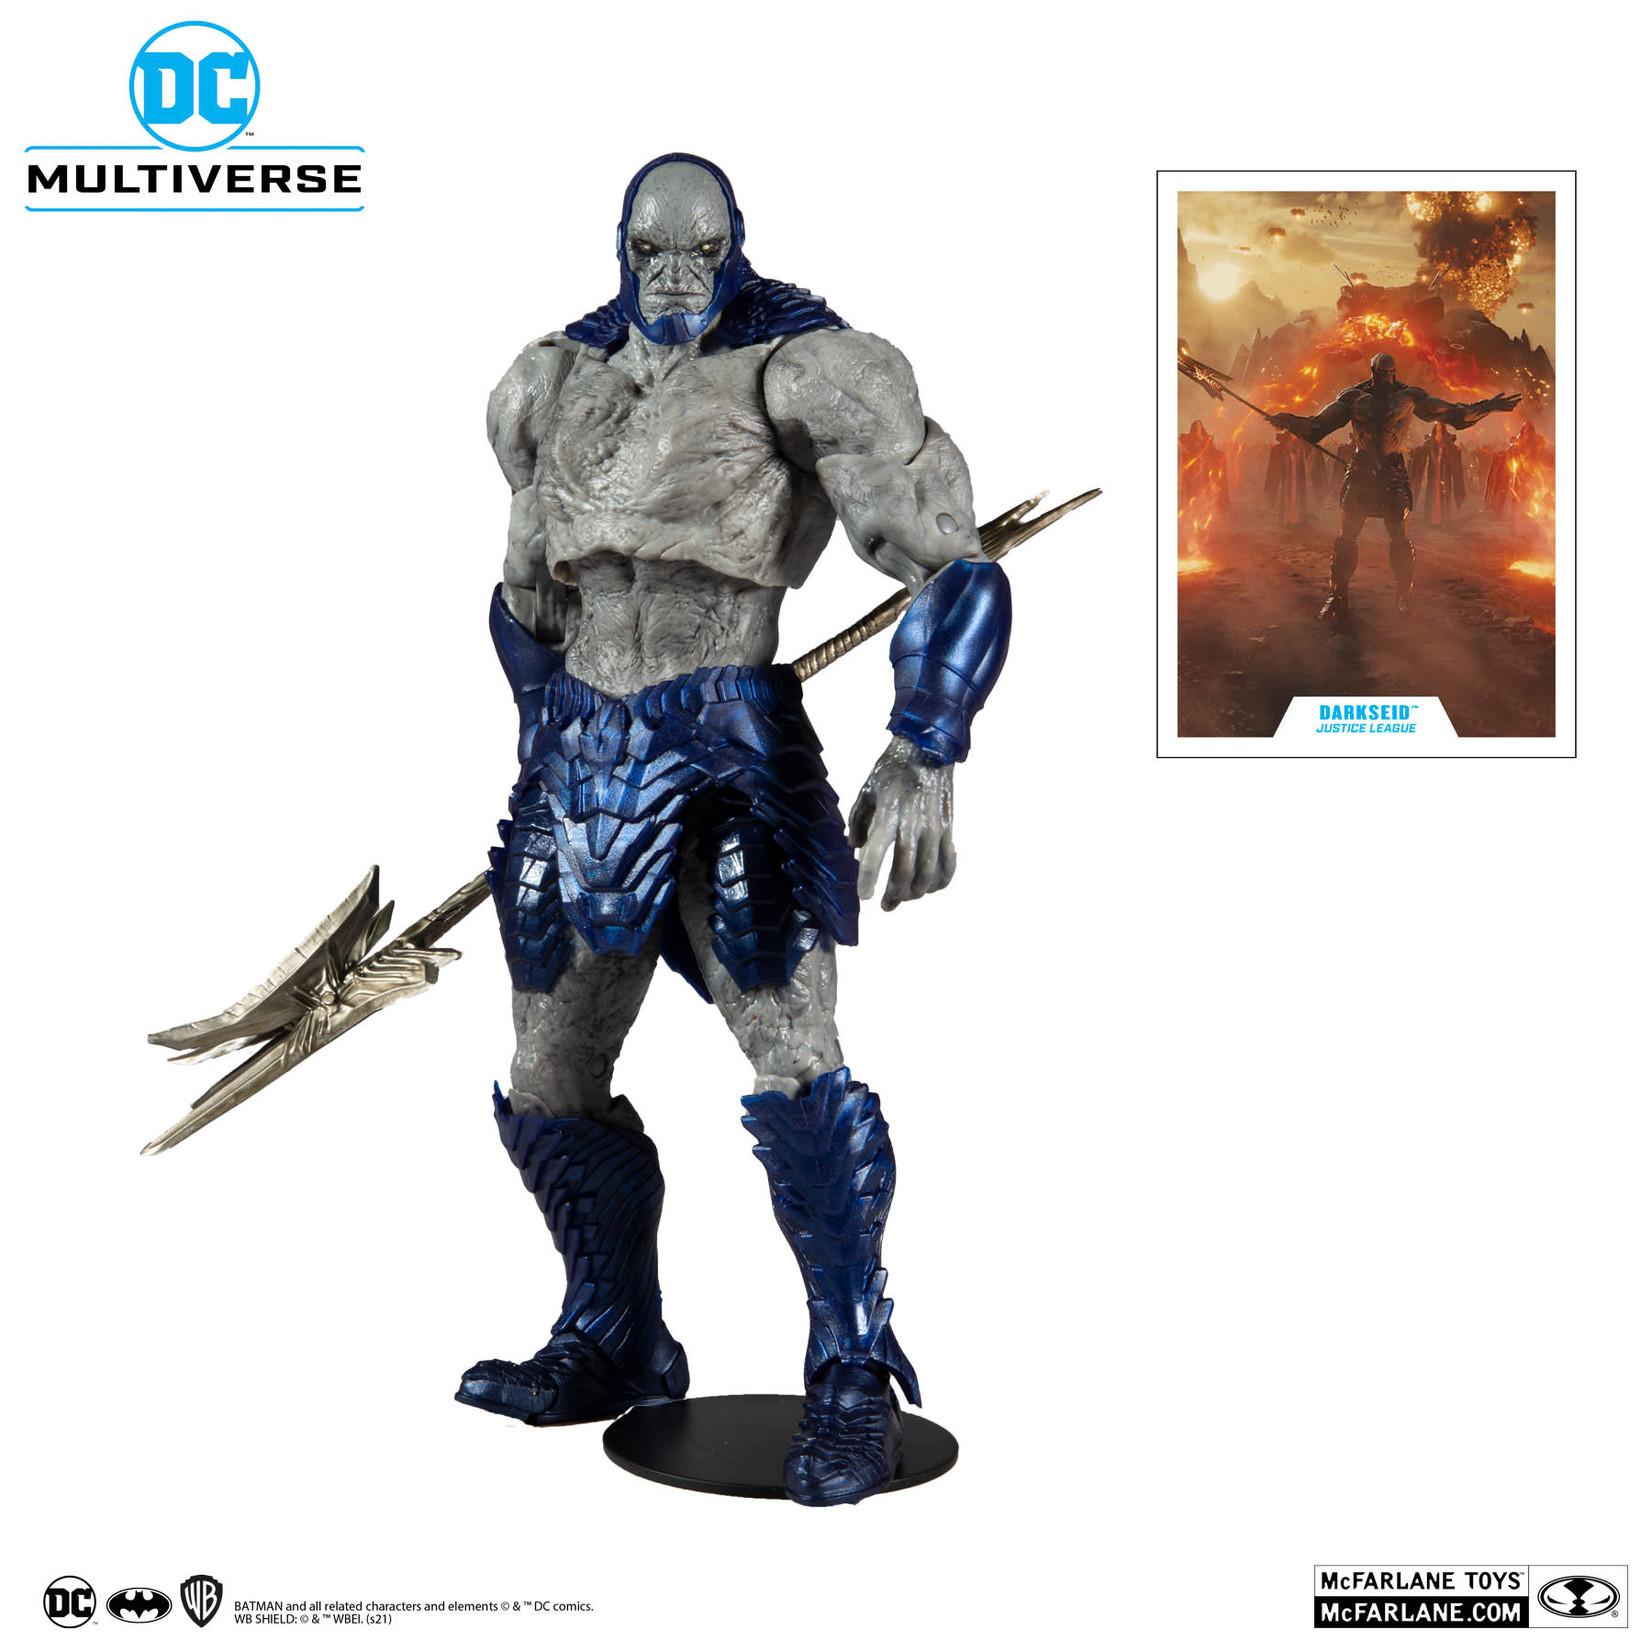 McFarlane Toys DC JUSTICE LEAGUE DARKSEID